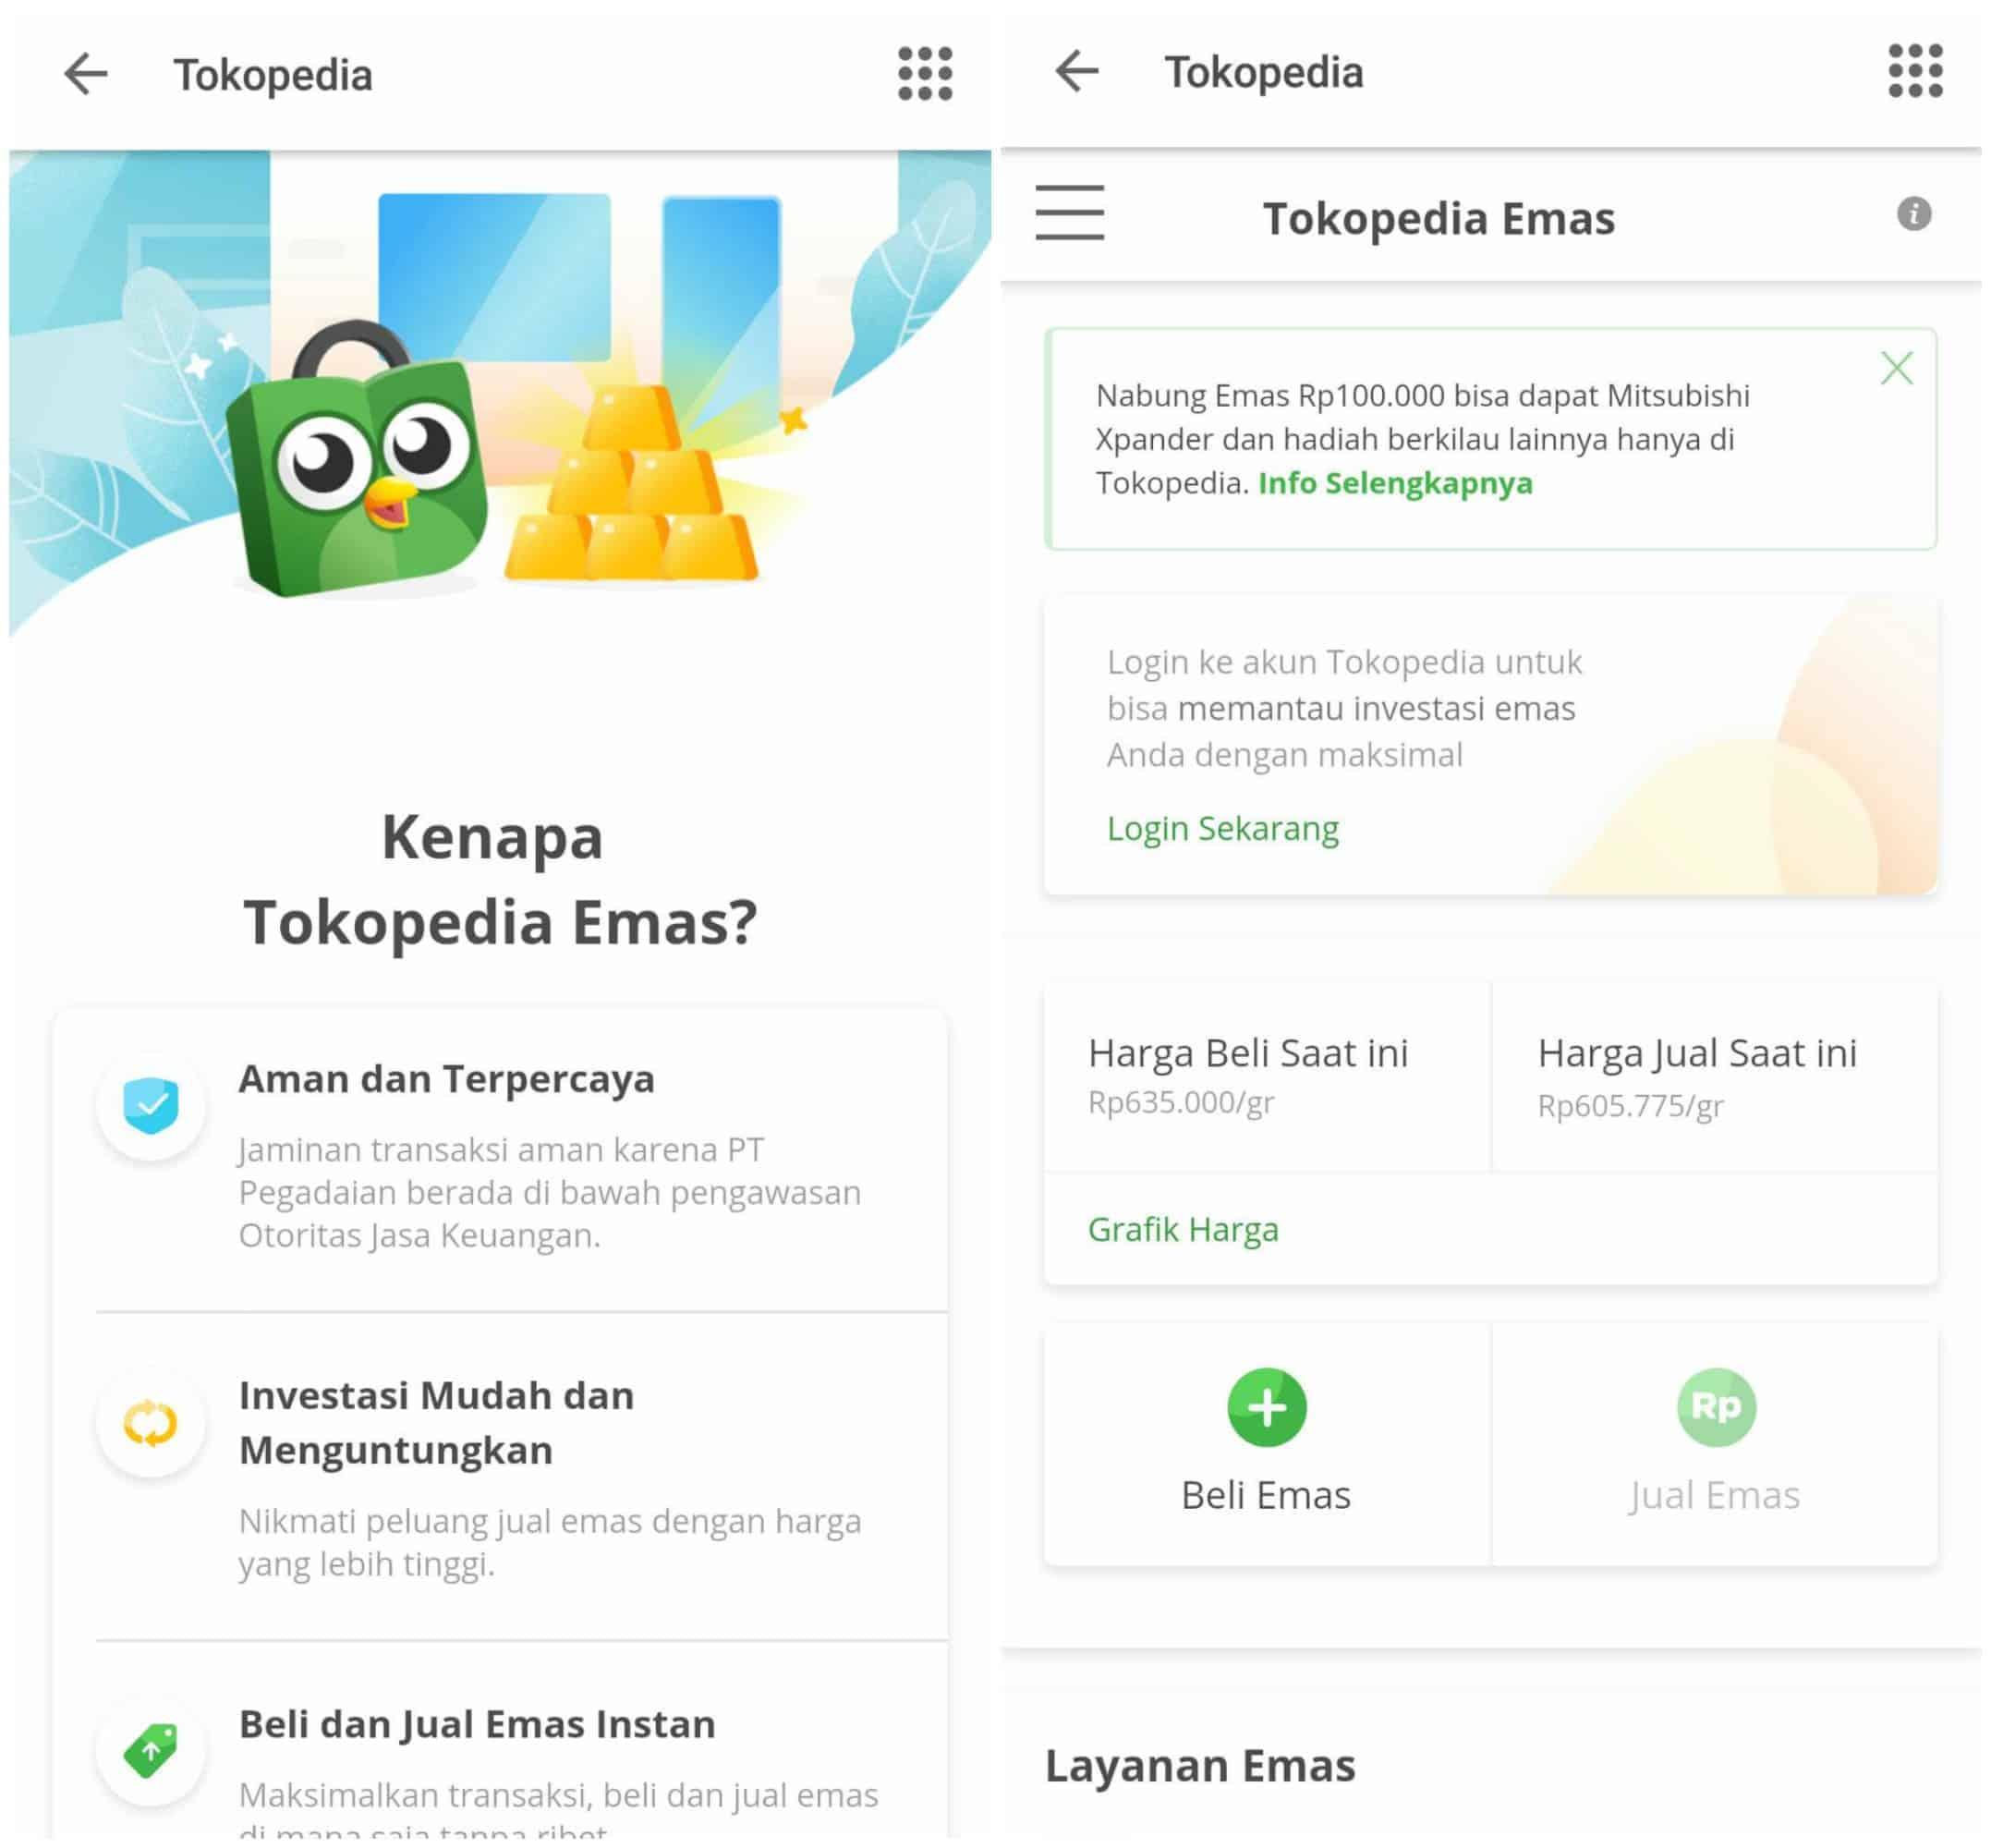 Tokopedia Emas Investasi Online